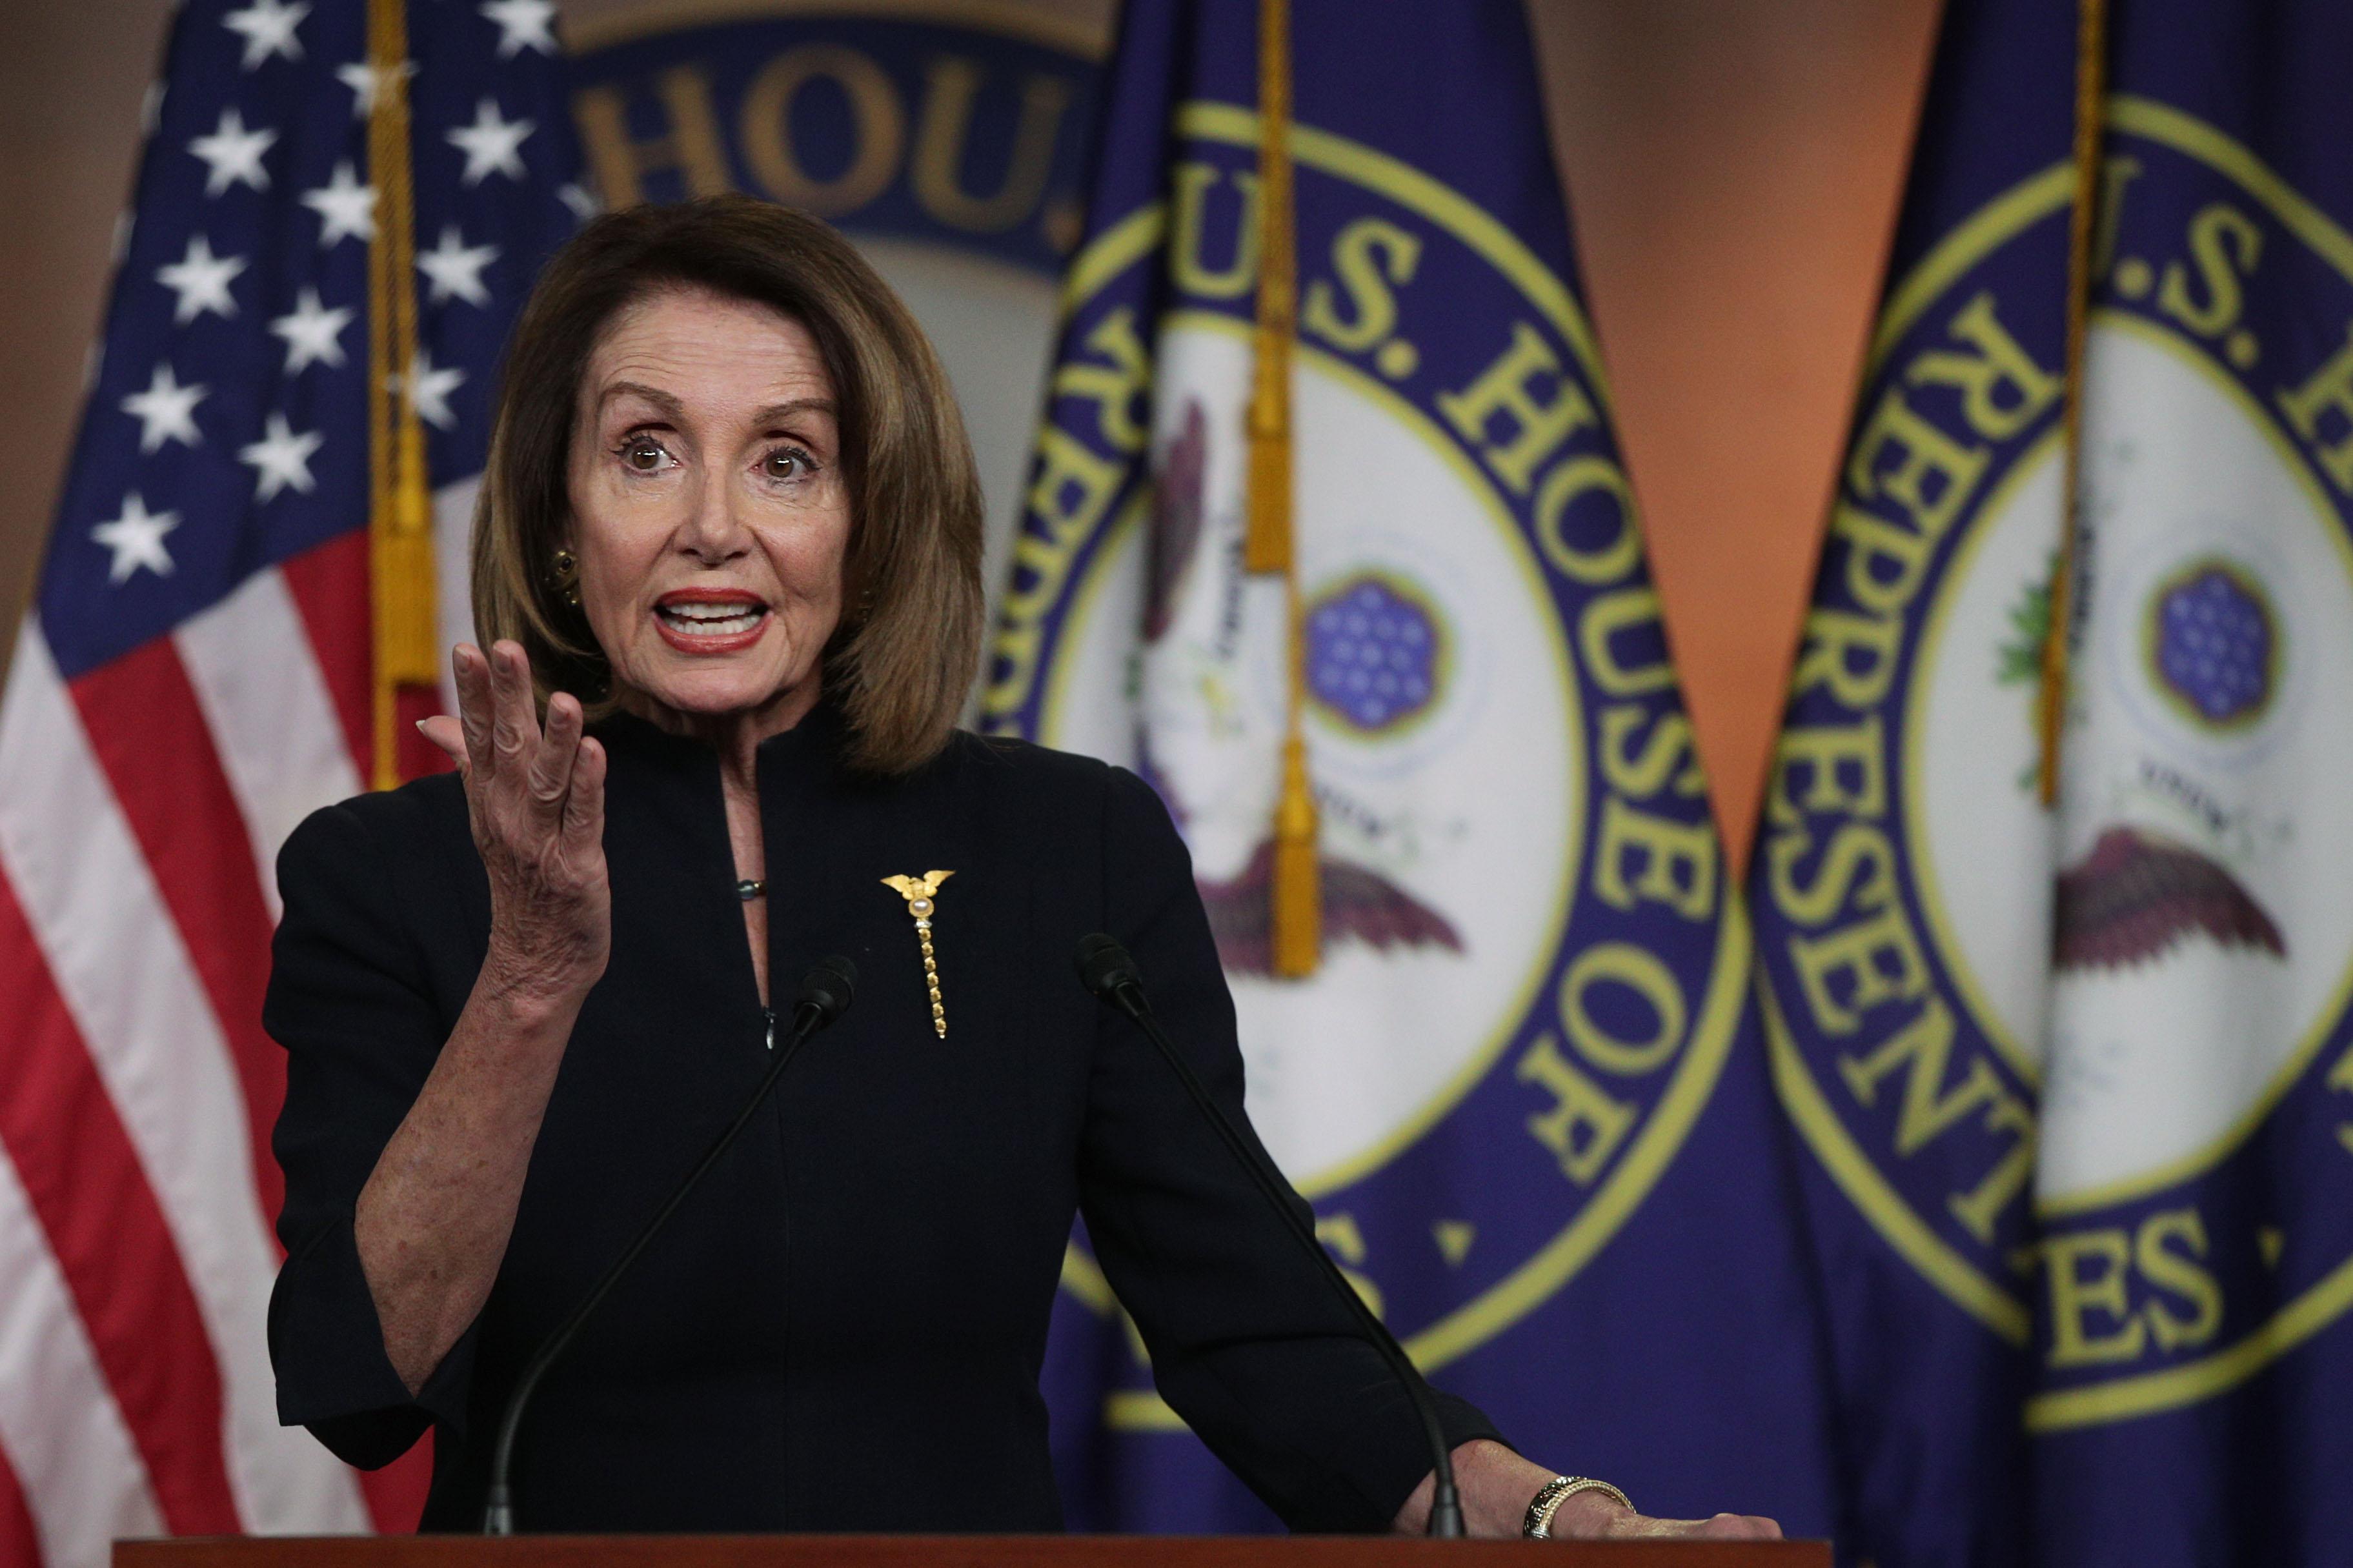 Pelosi says Trump's national emergency sets a new precedent for Democrats